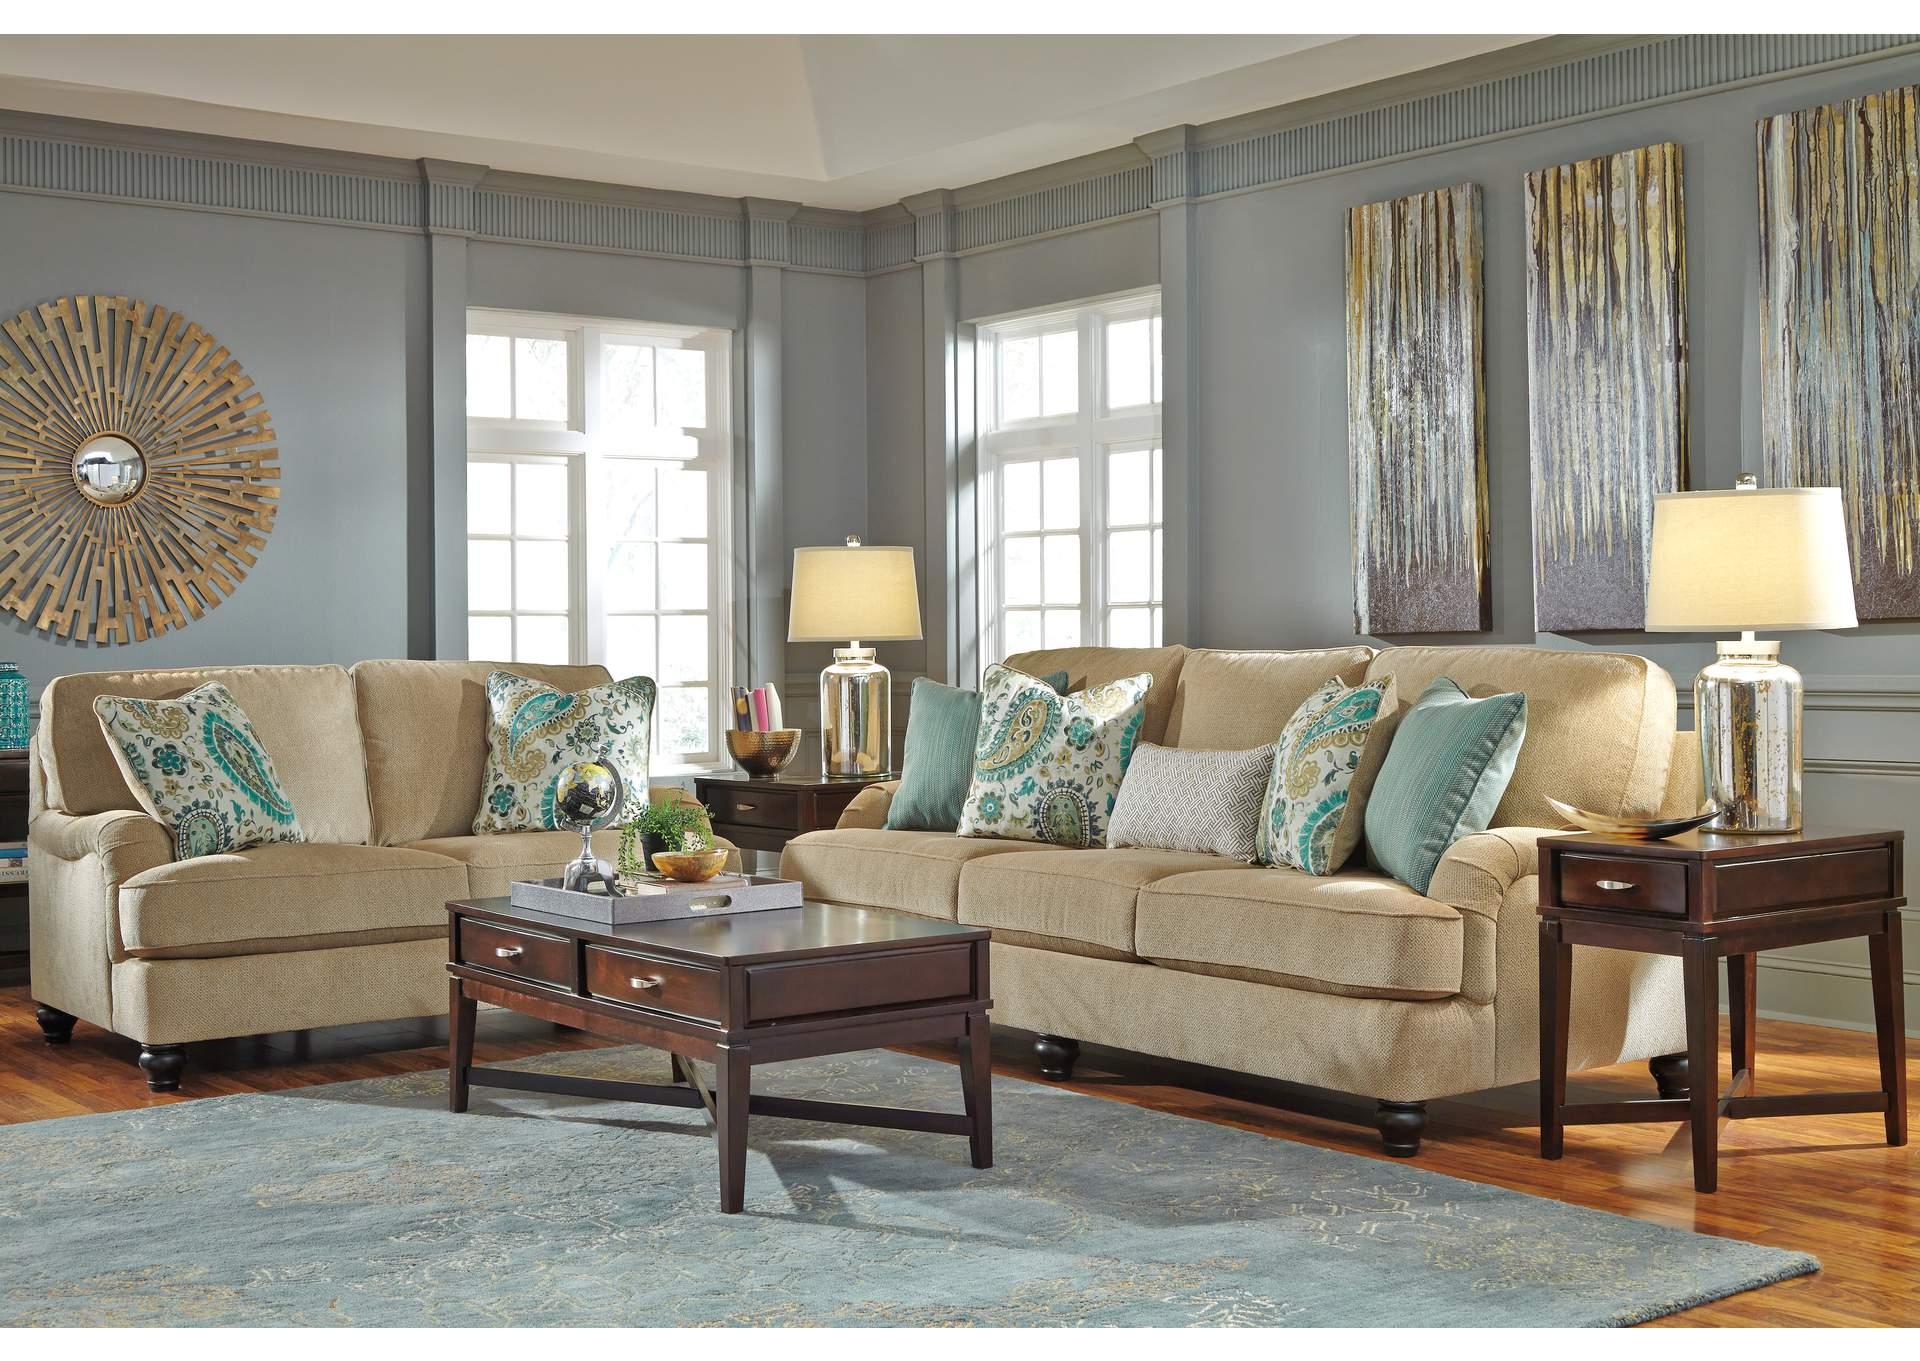 Austin 39 S Couch Potatoes Furniture Stores Austin Texas Lochian Bisque S